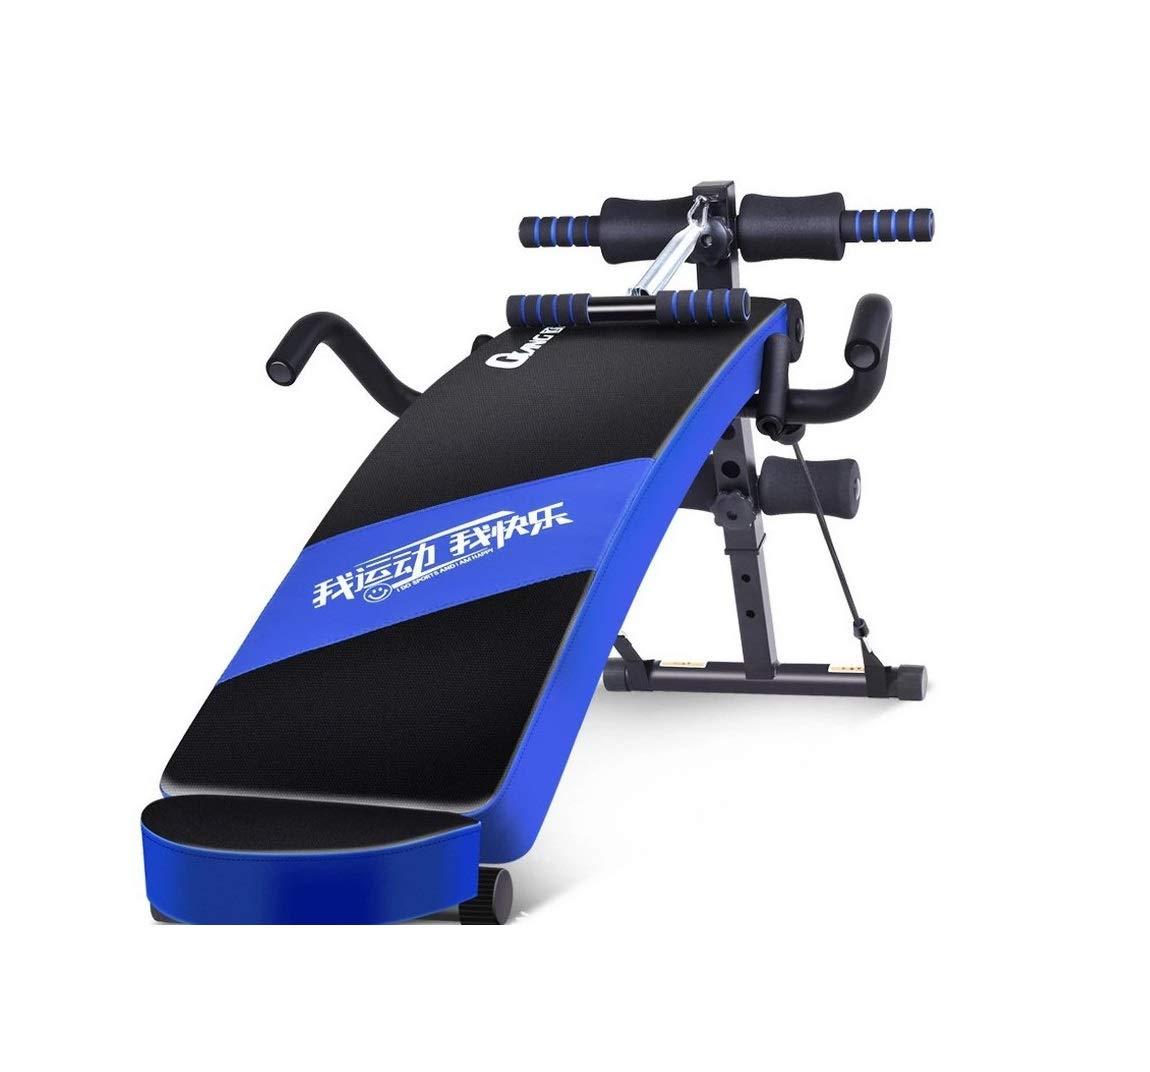 GaoMiTA Sit-up Board Multi-Function Abdominal Board Home Fitness Equipment Sit-ups Abdomen Machine Abdominal Device